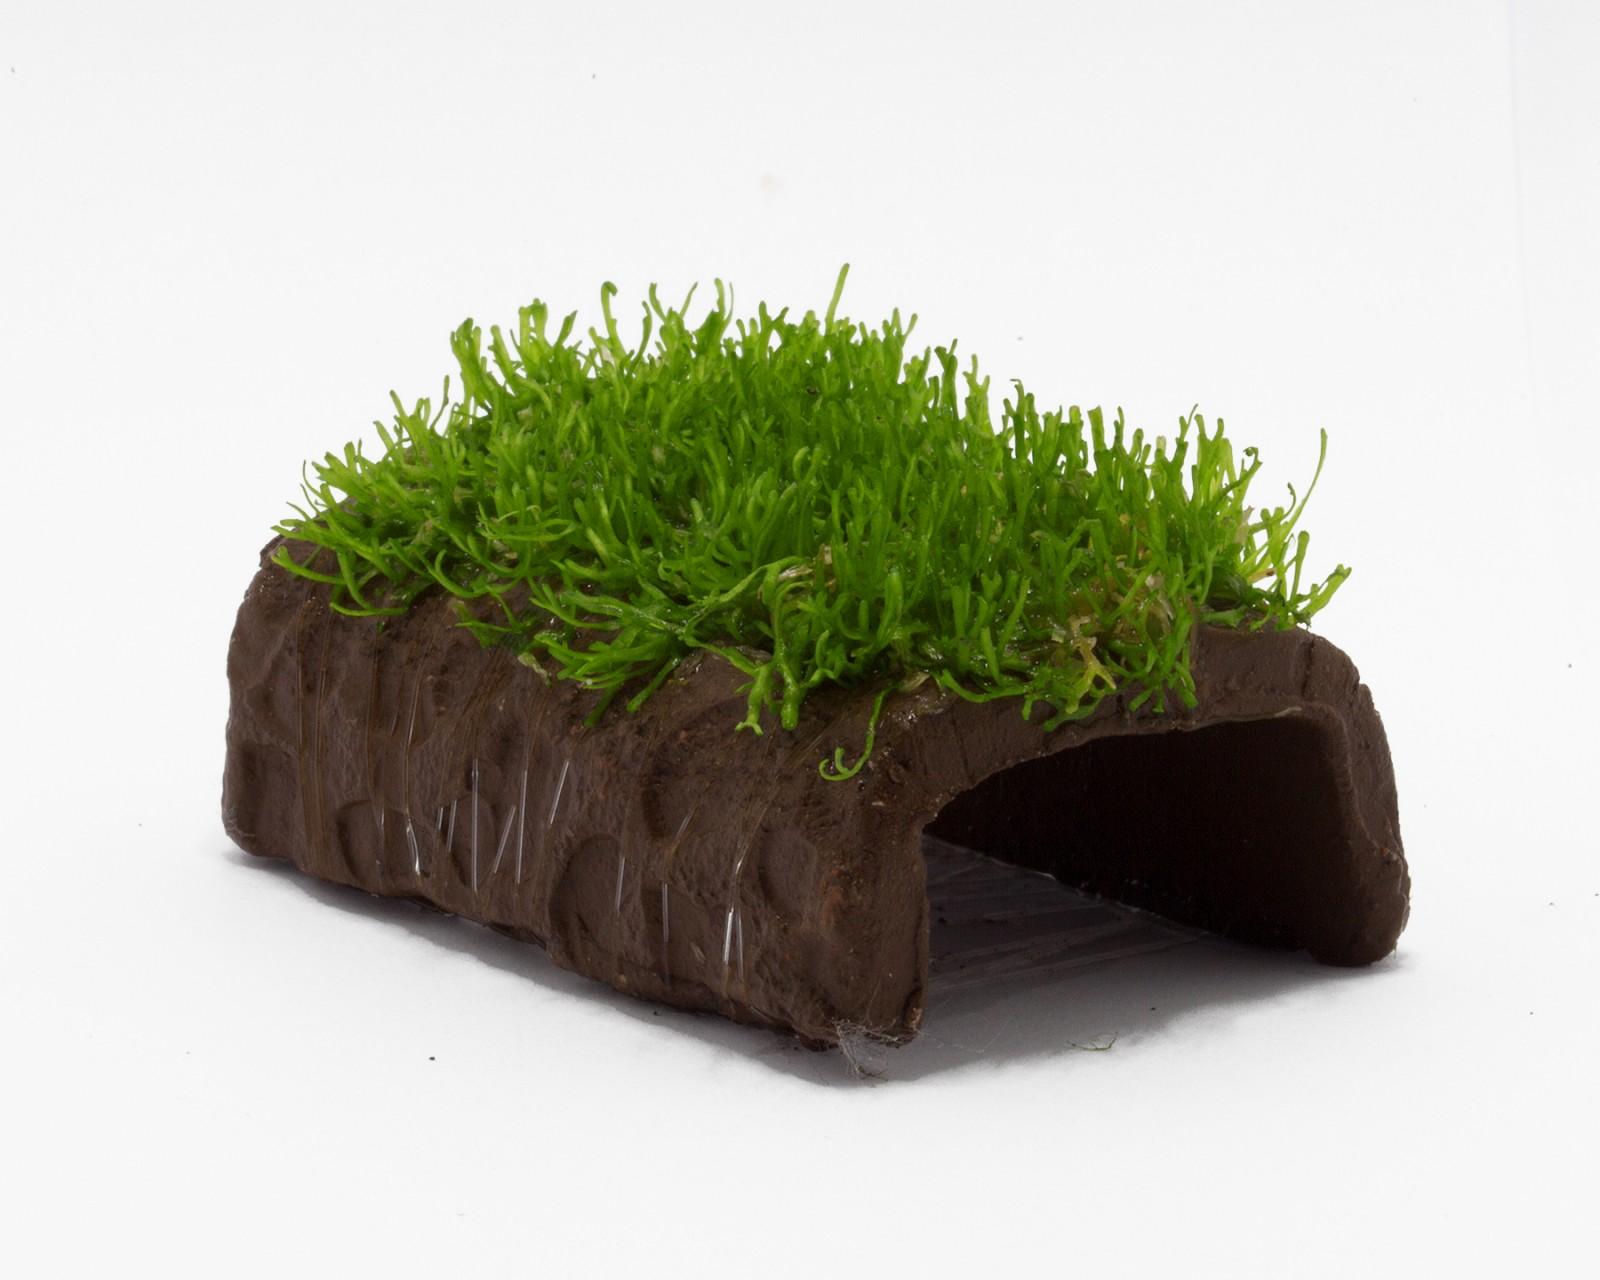 mit moos bepflanzte versteckpl tze aus keramik f r. Black Bedroom Furniture Sets. Home Design Ideas